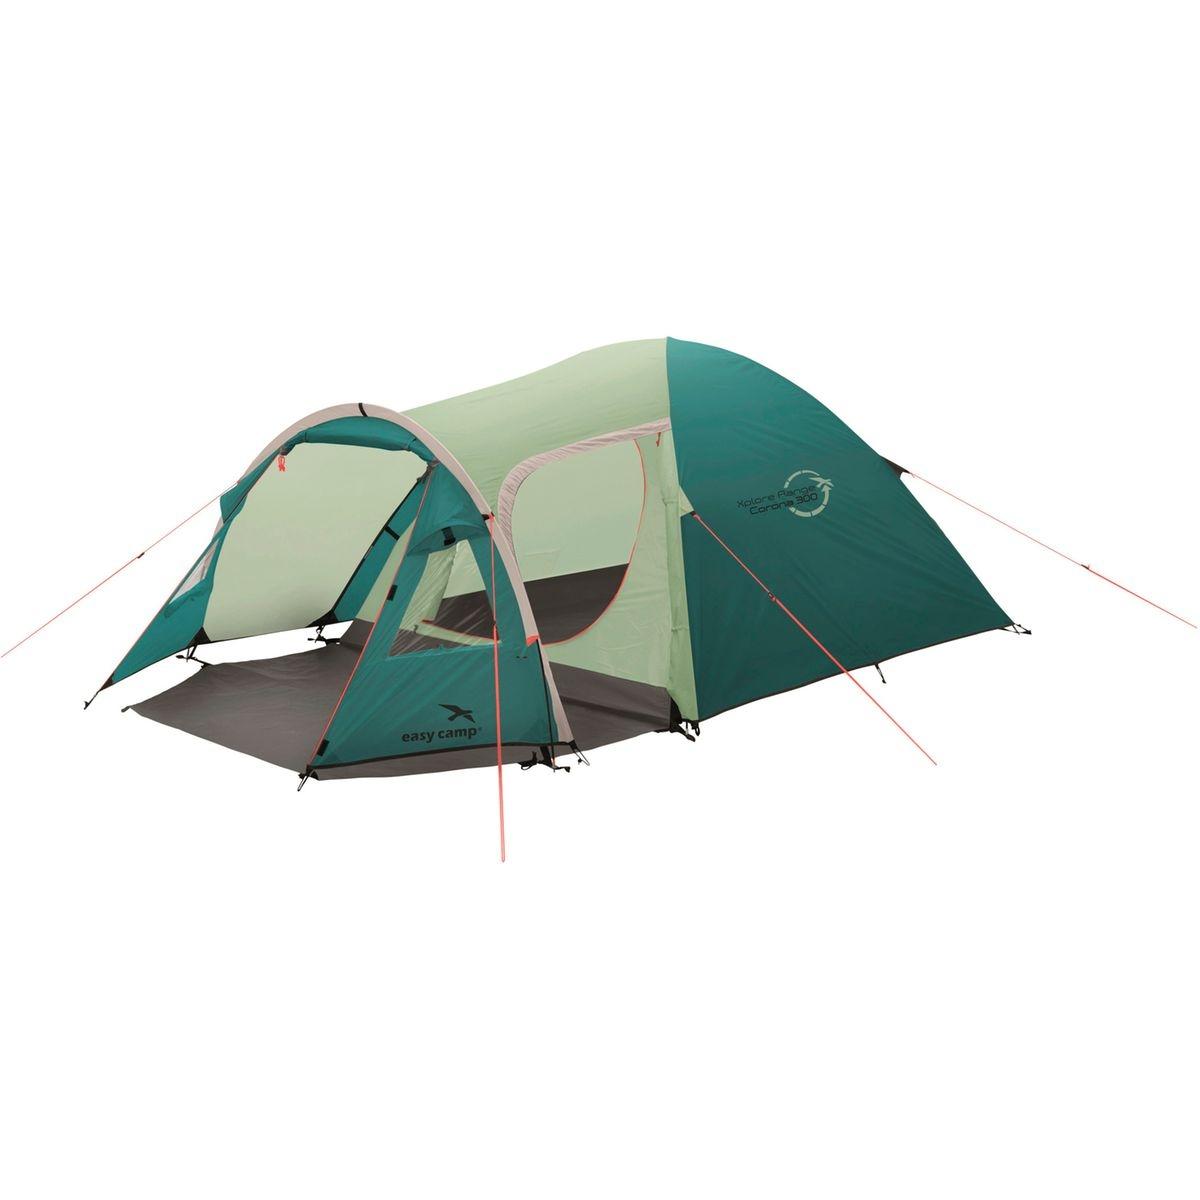 Corona 300 - Tente - vert